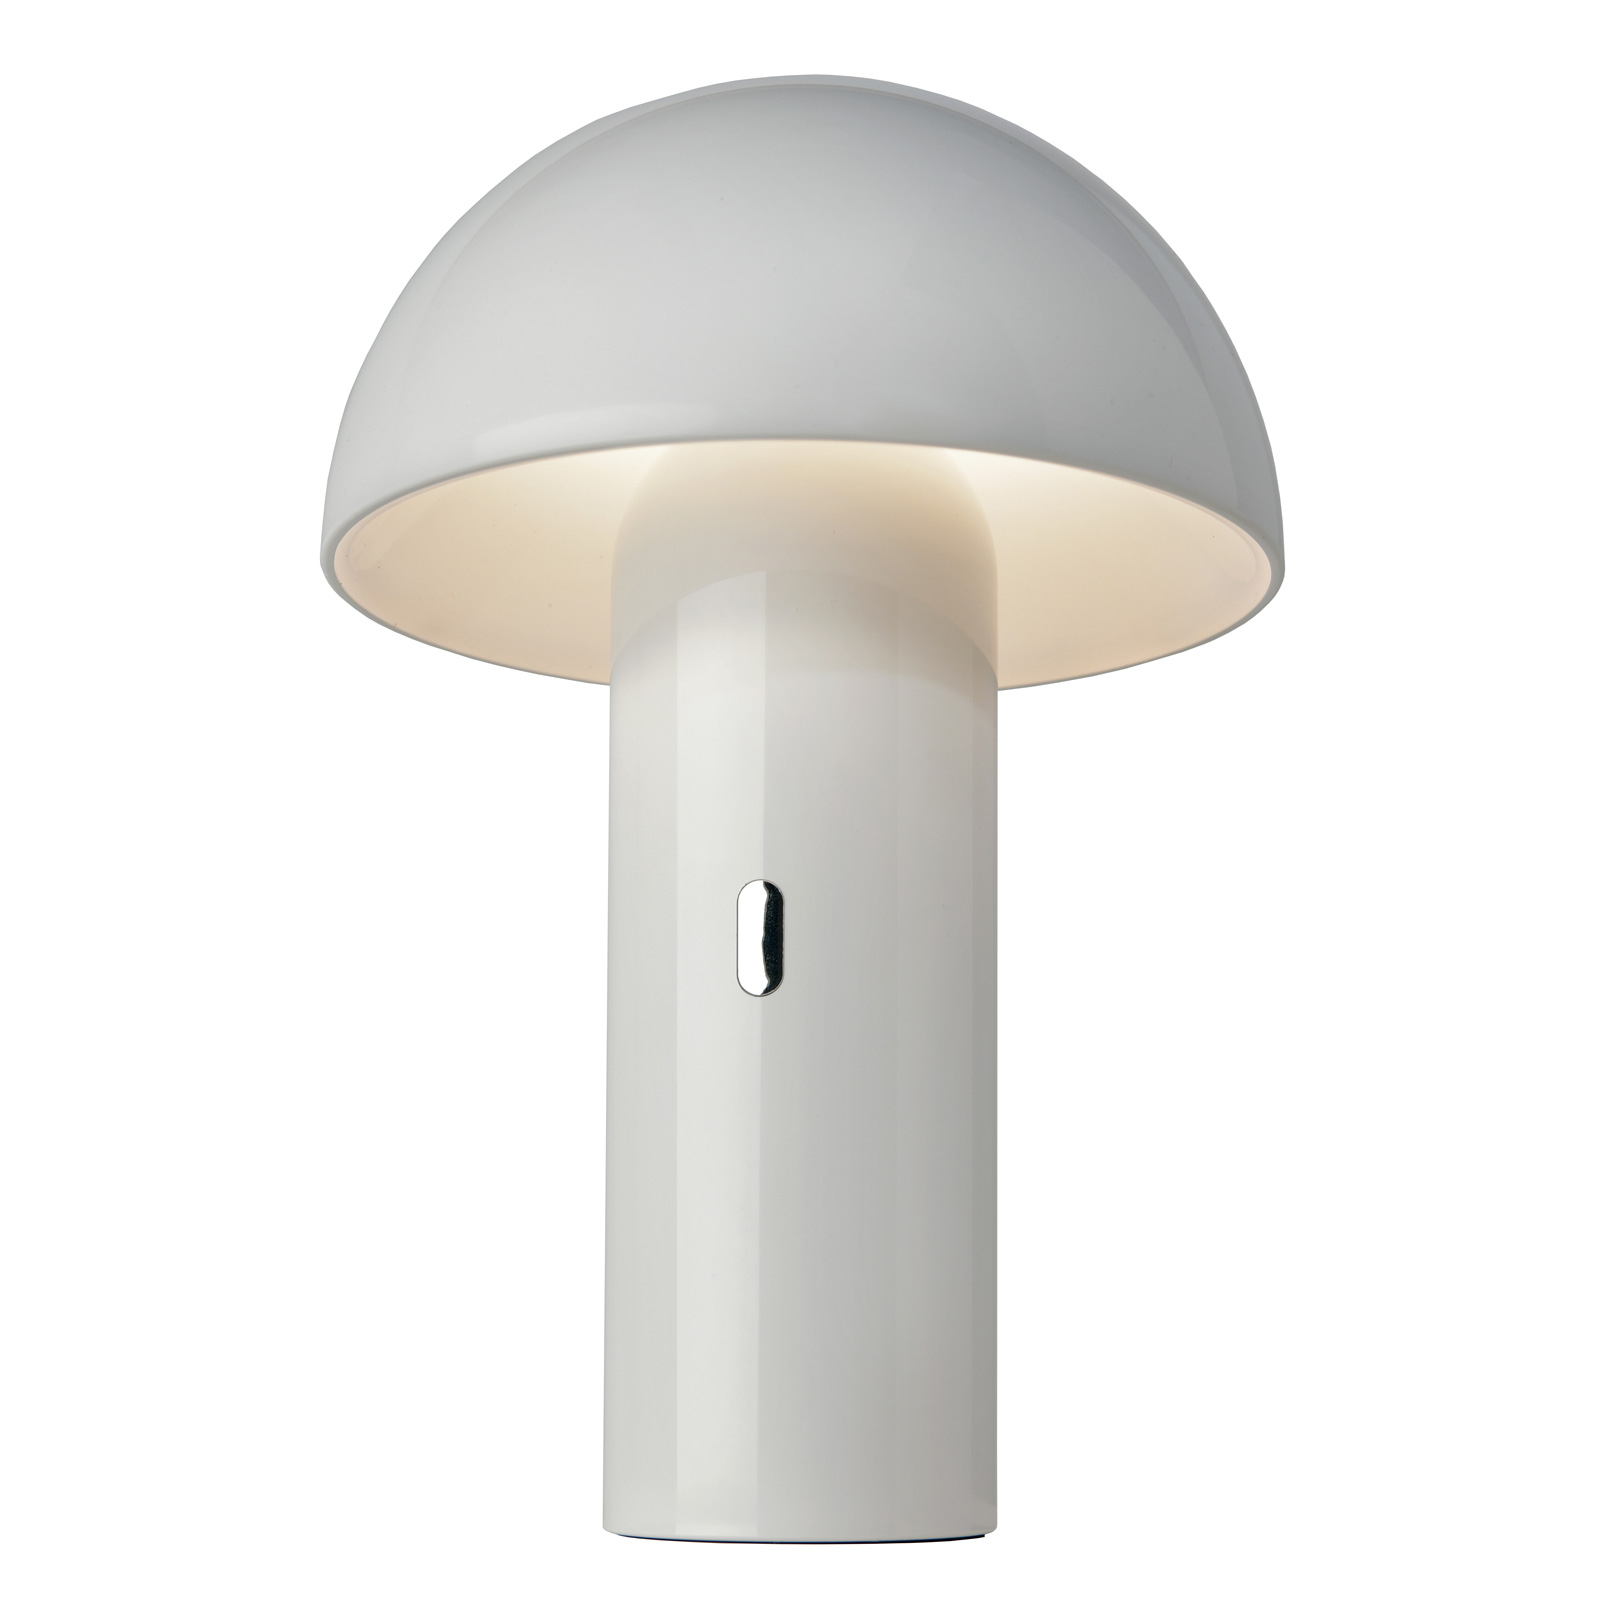 LED tafellamp Svamp met accu, draaibaar, wit